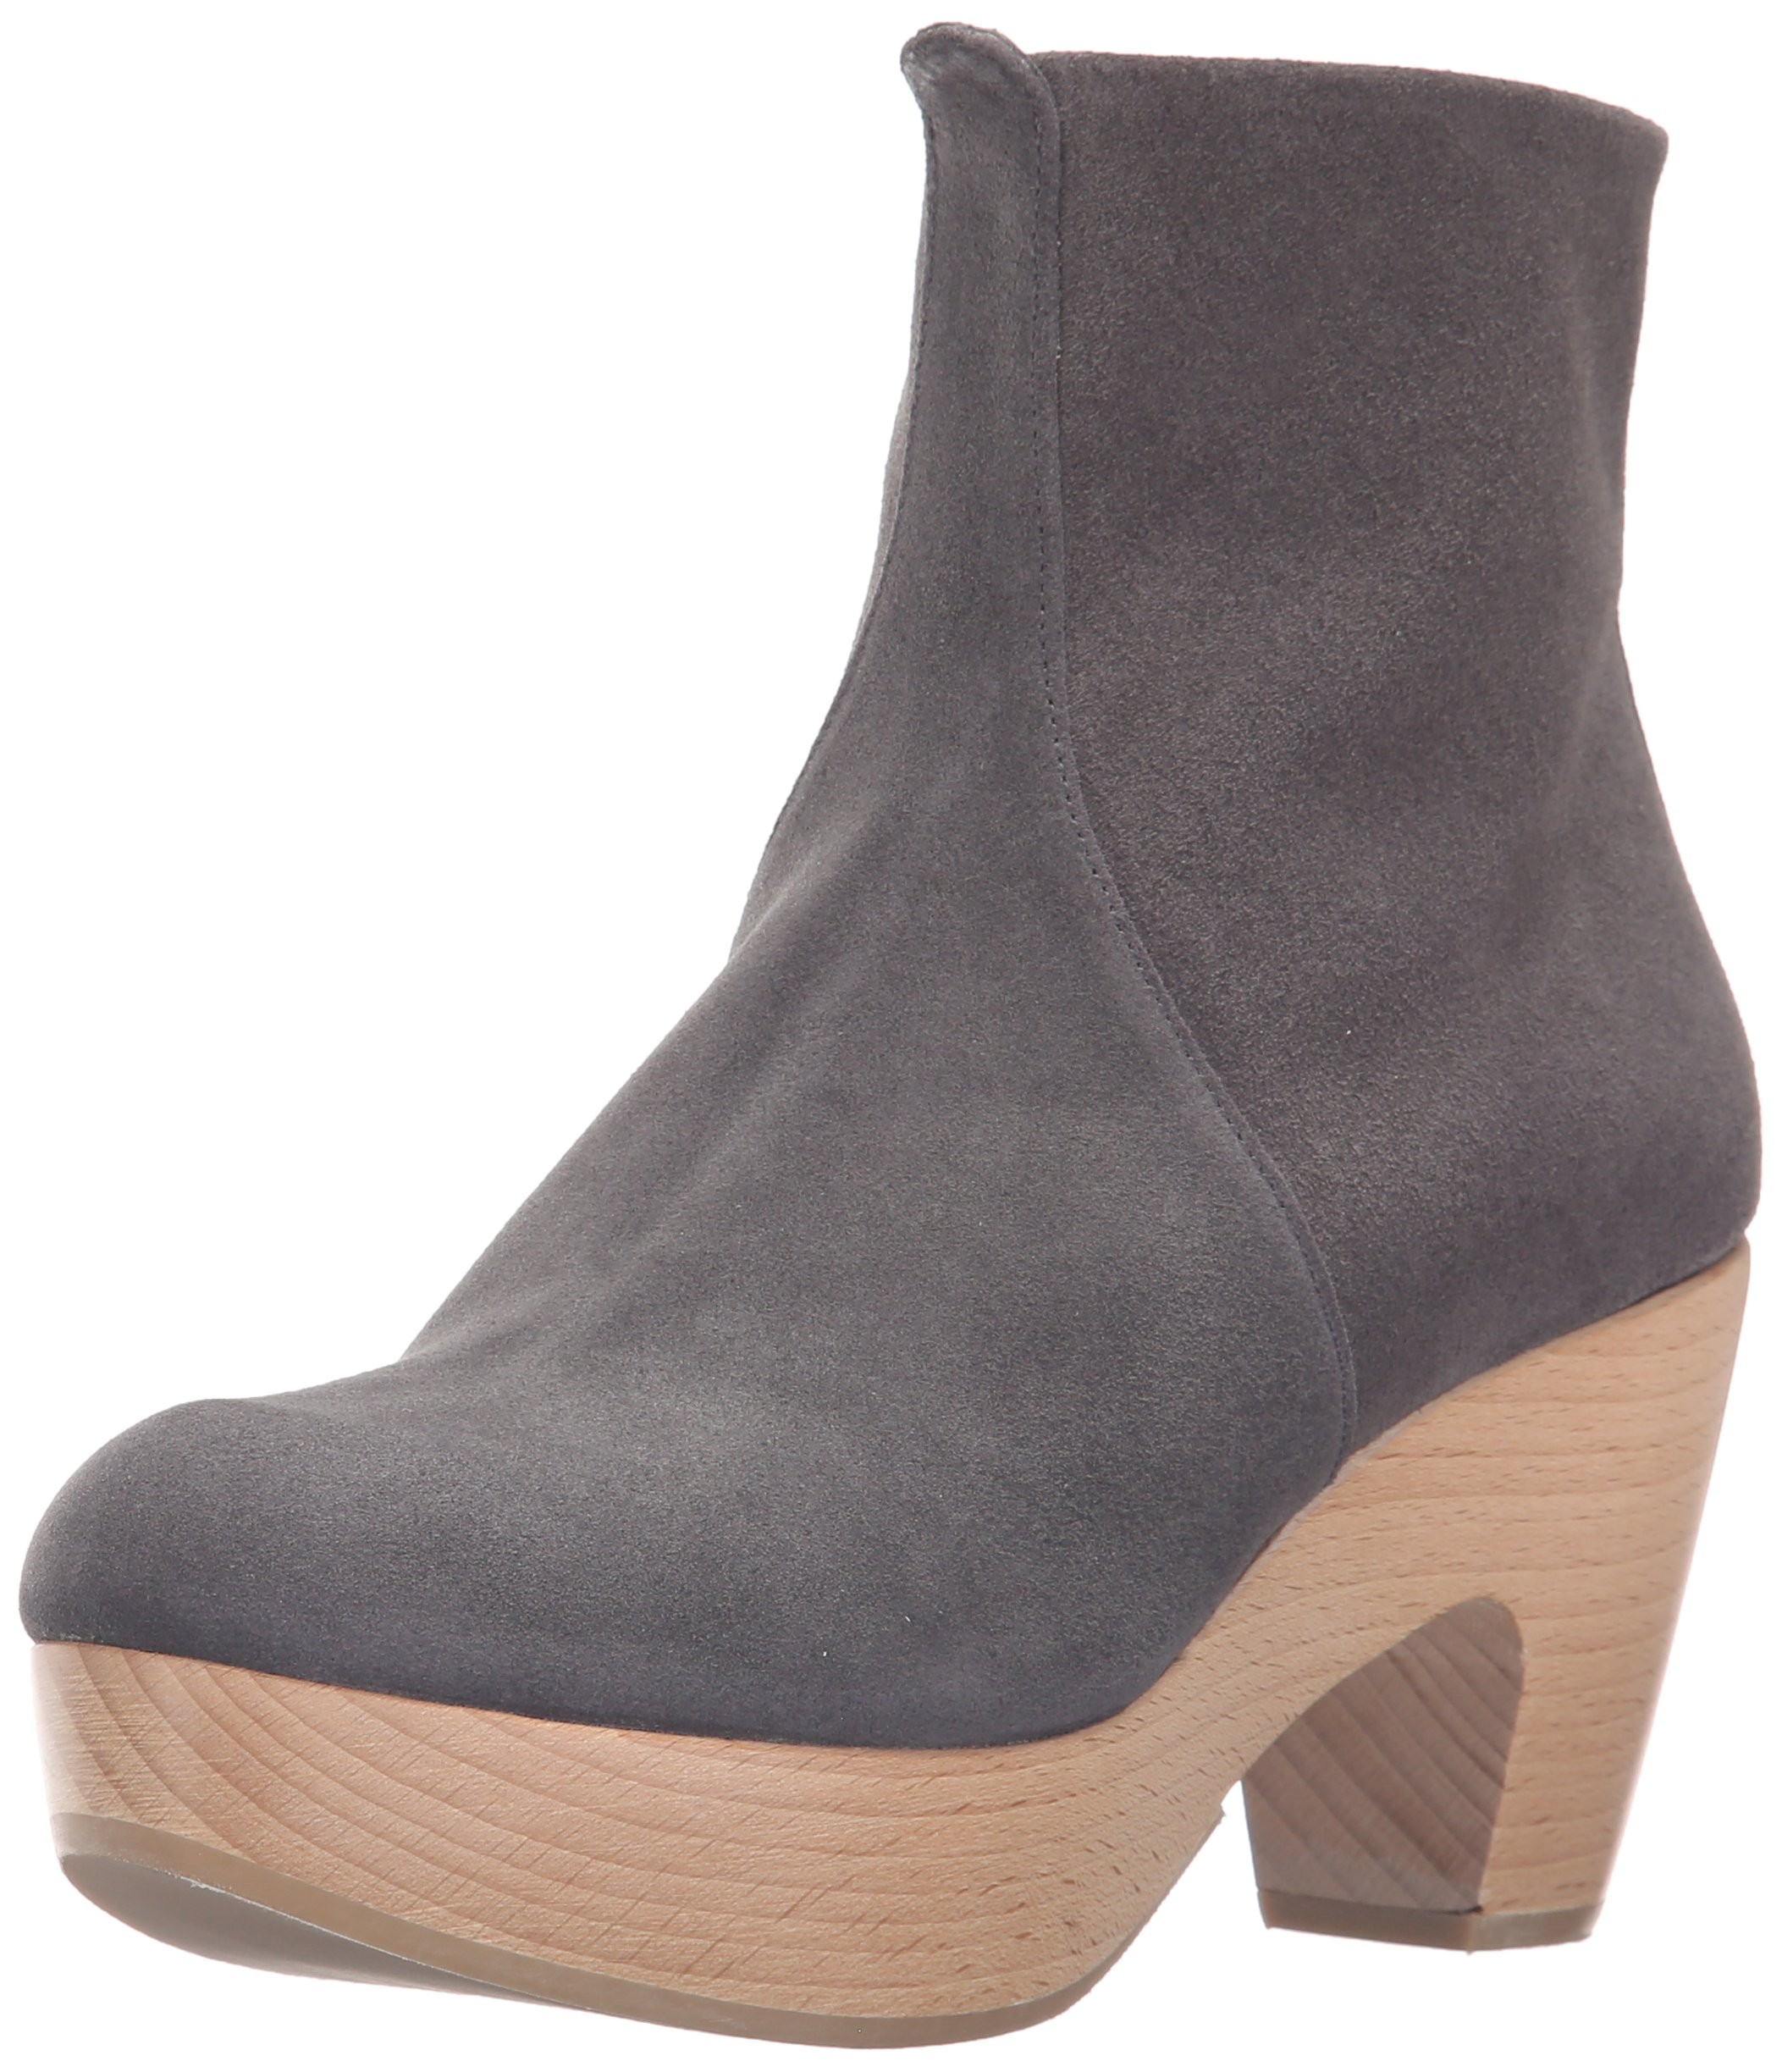 Coclico Women's Tecla Boot, Grey, 40 EU/9.5-10 M US